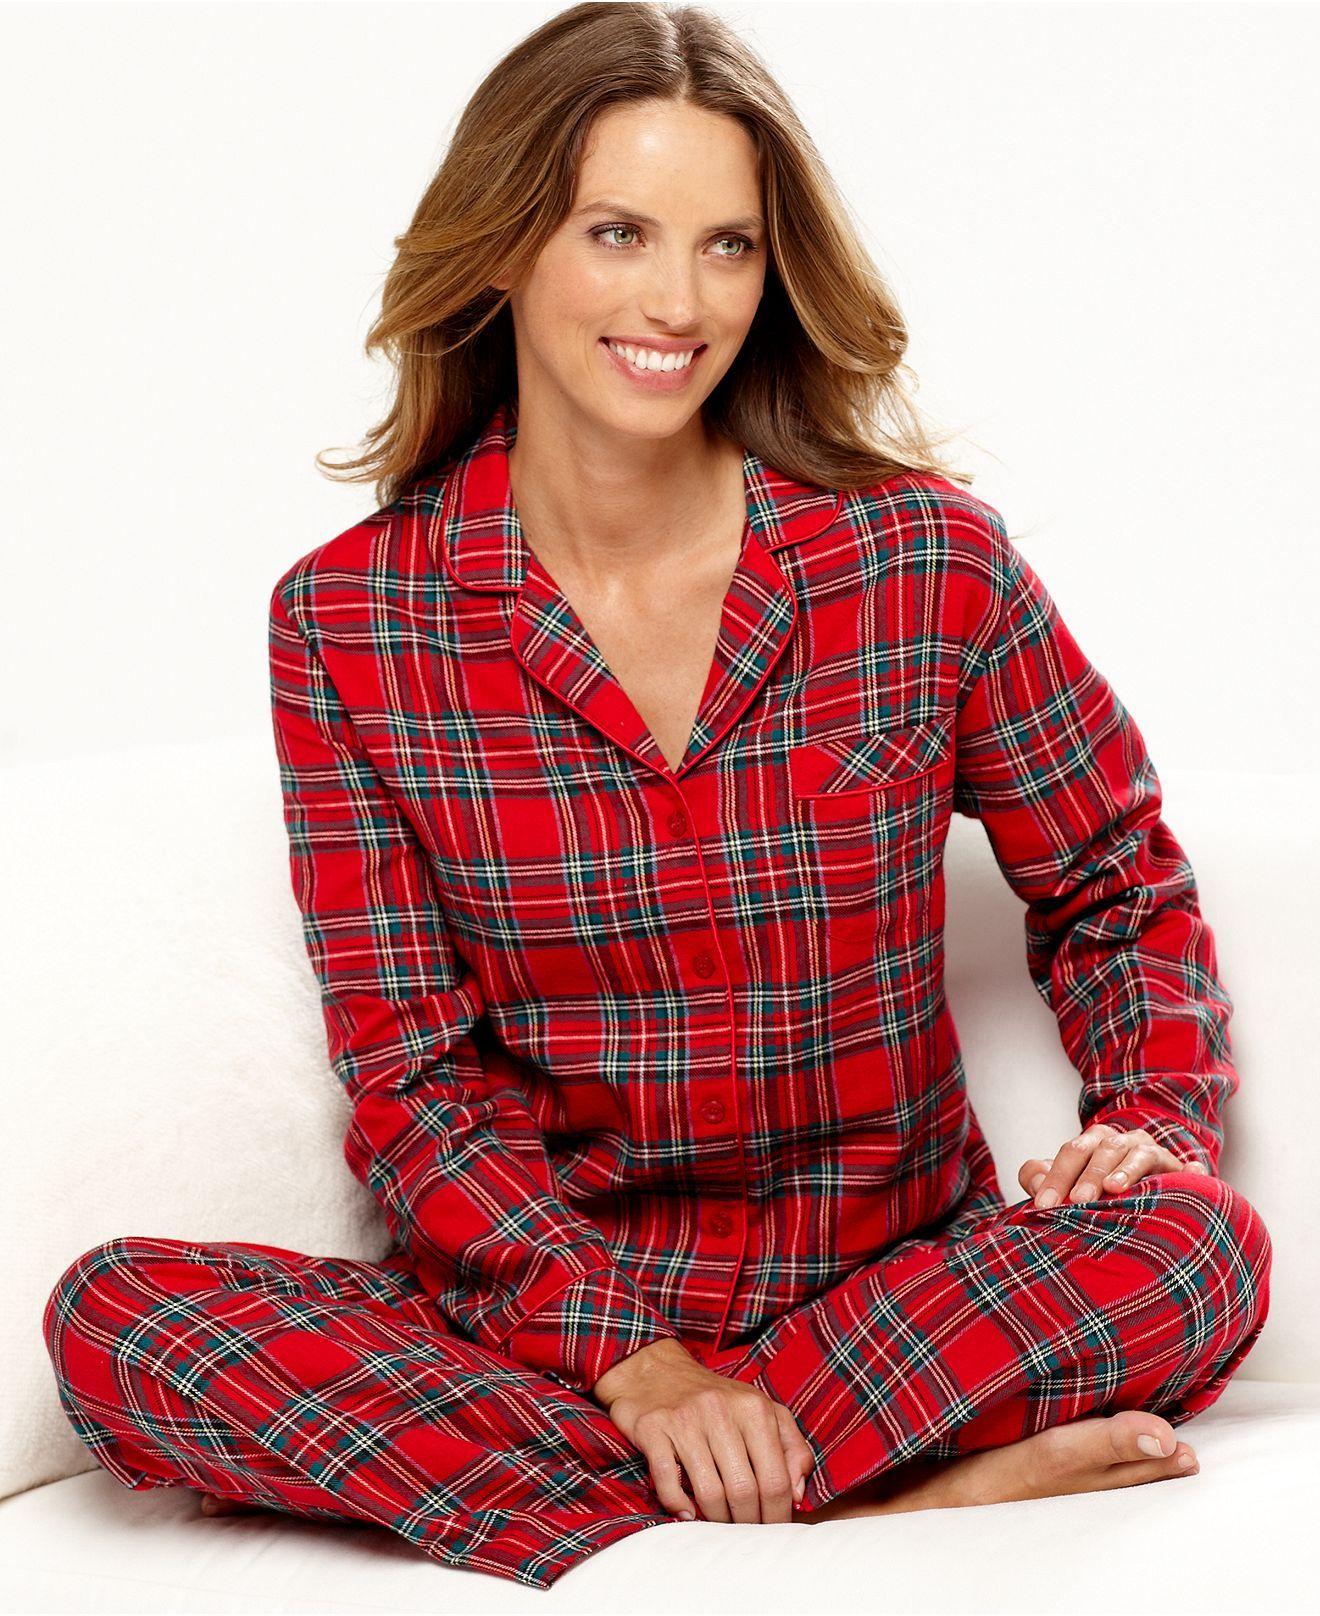 85127a824f192 Charter Club Pajamas